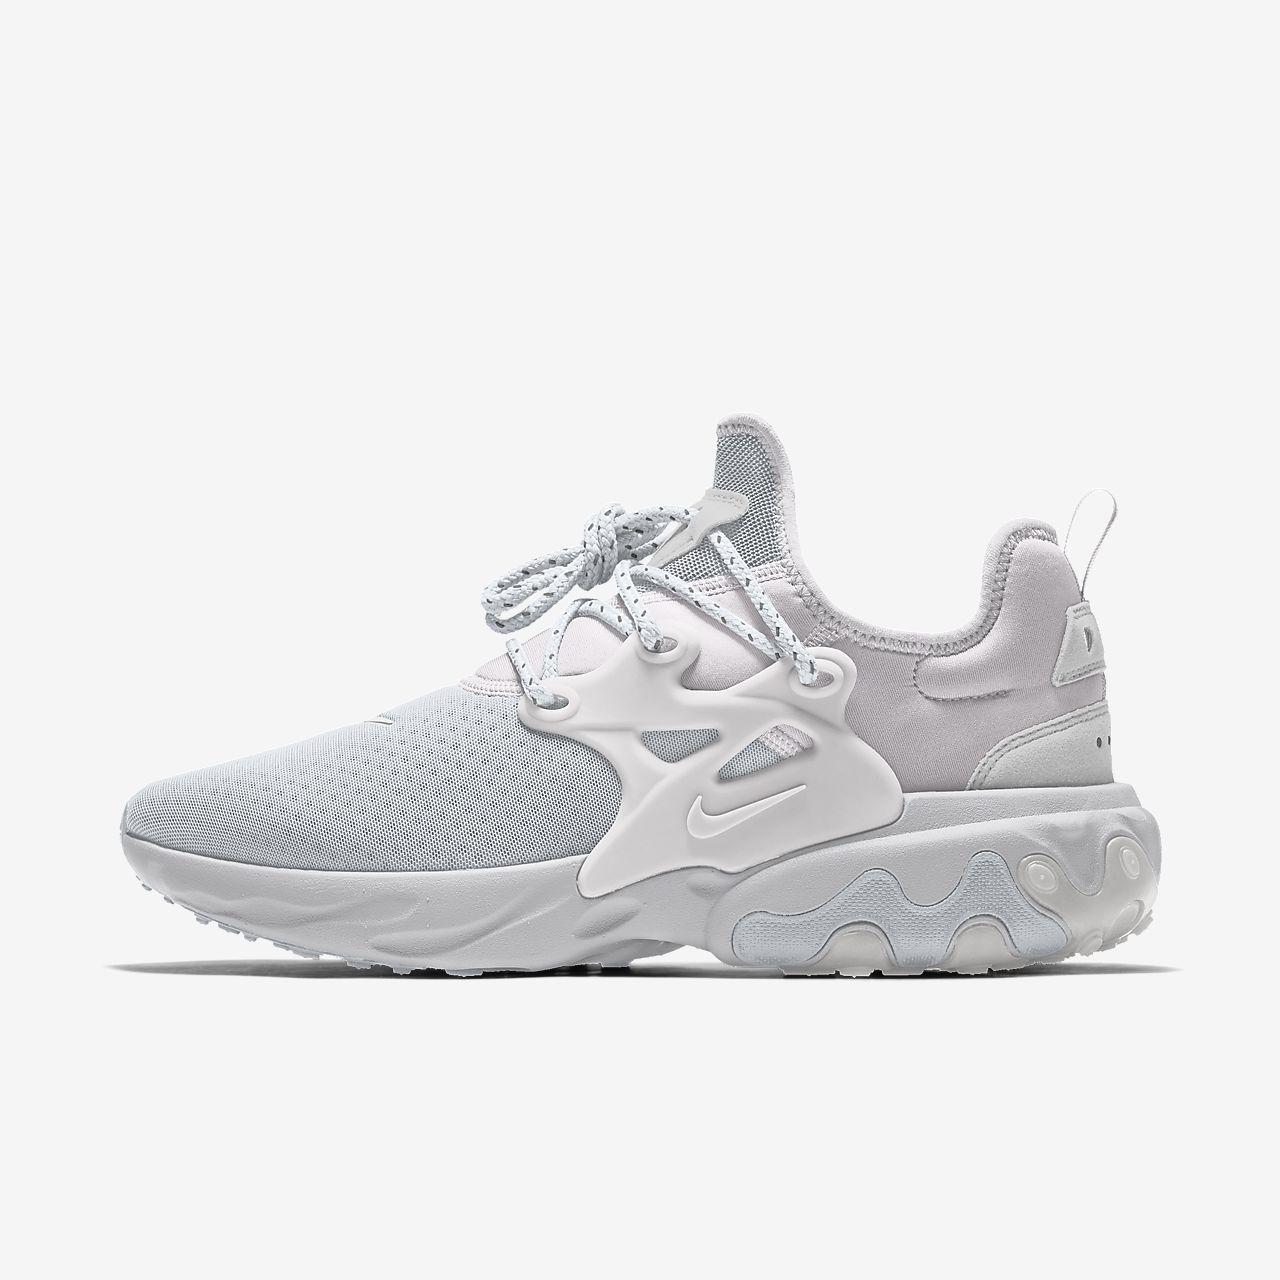 Custom Nike React Presto By You-sko til mænd